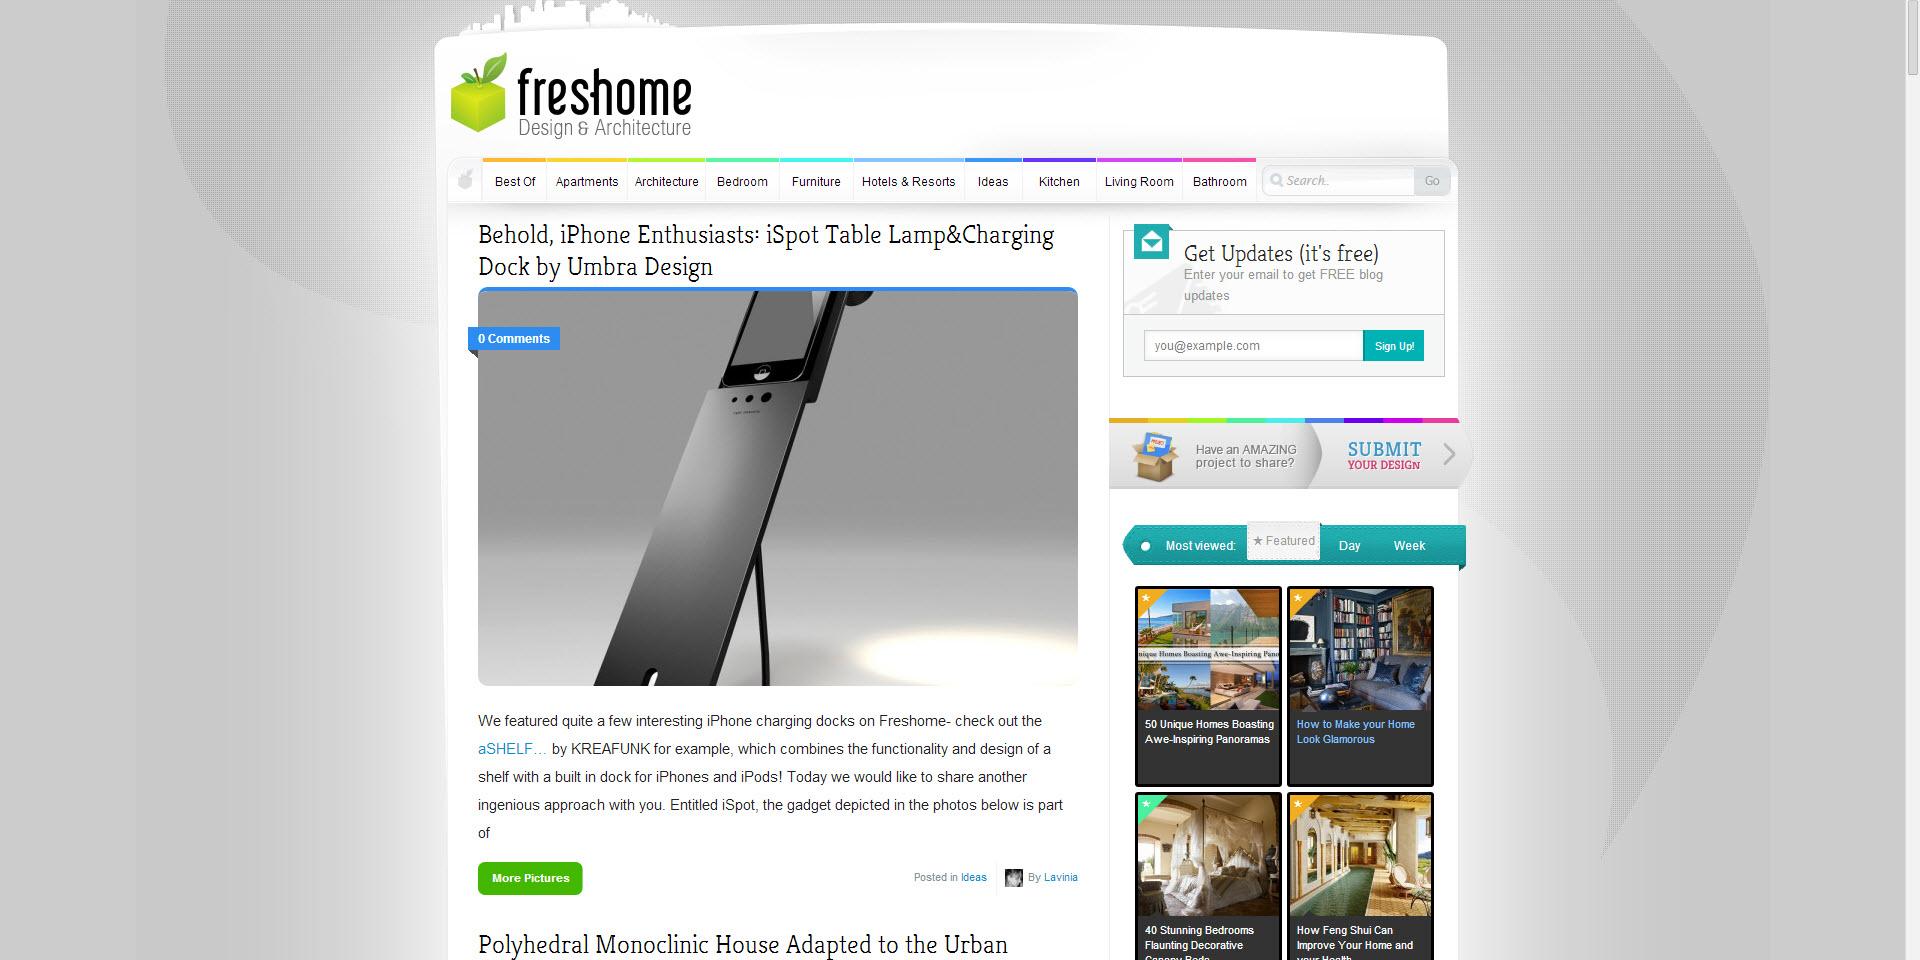 FresHome